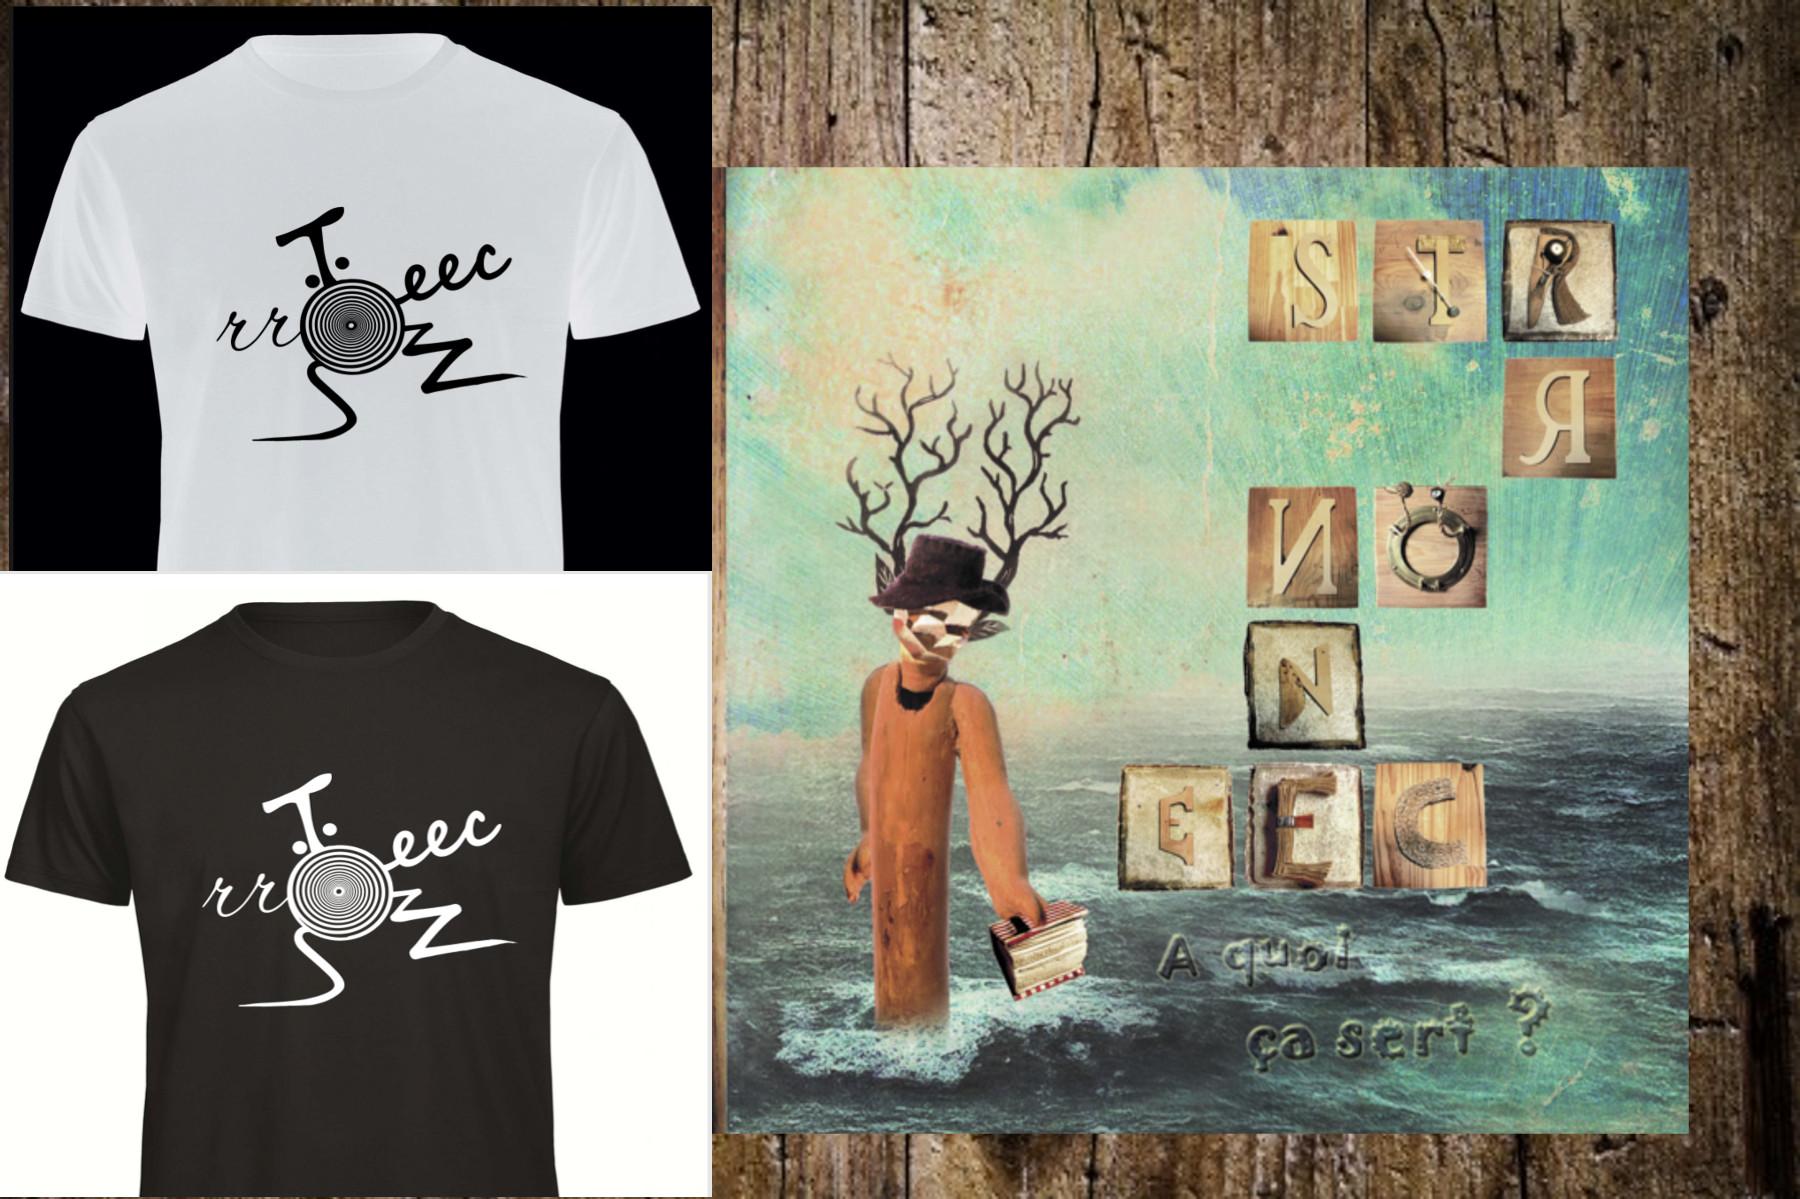 cd+_tee-shirt-1533518809.jpg